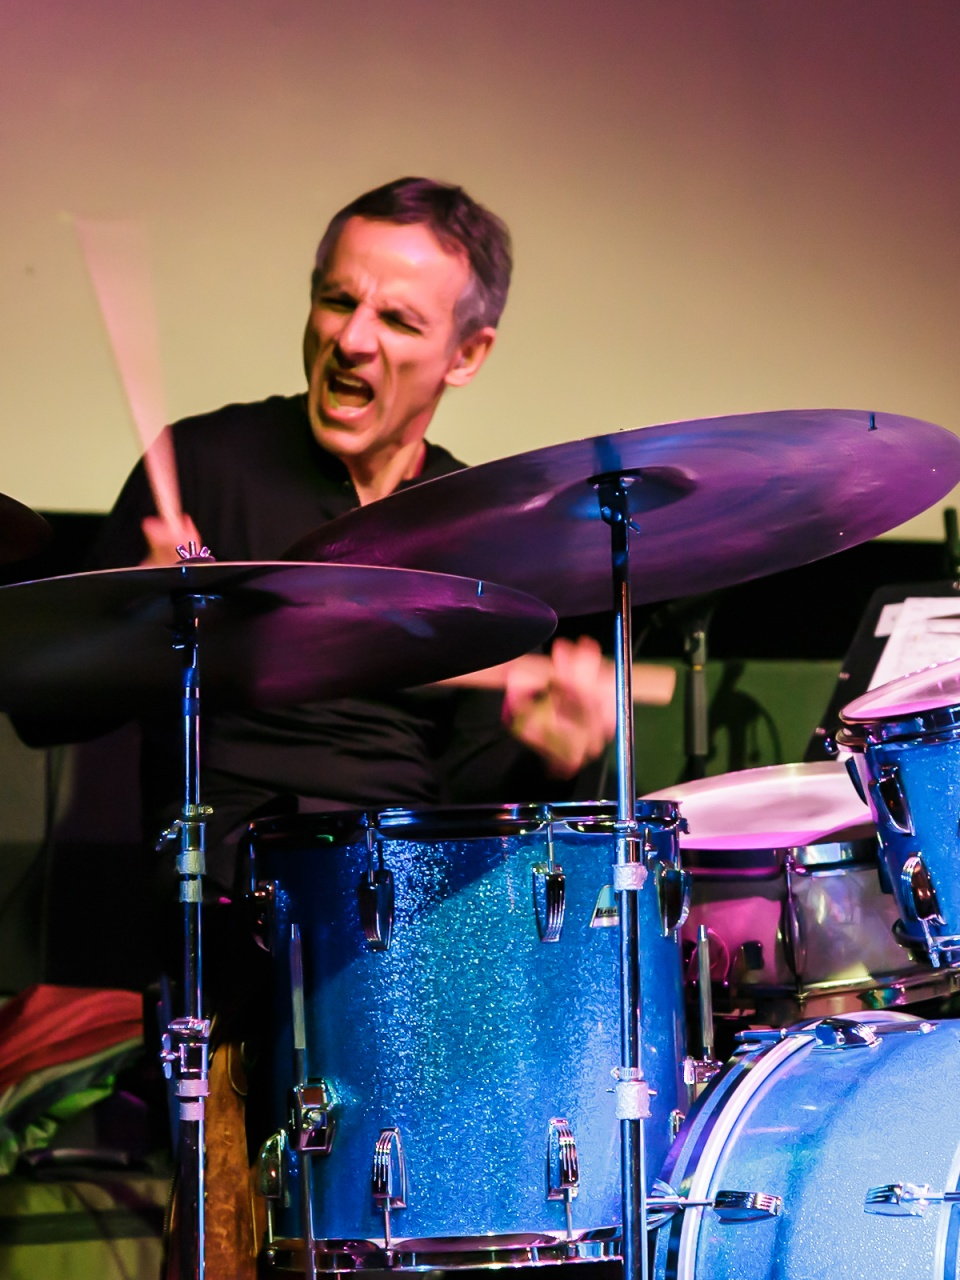 Drori Mondlak, Drummer